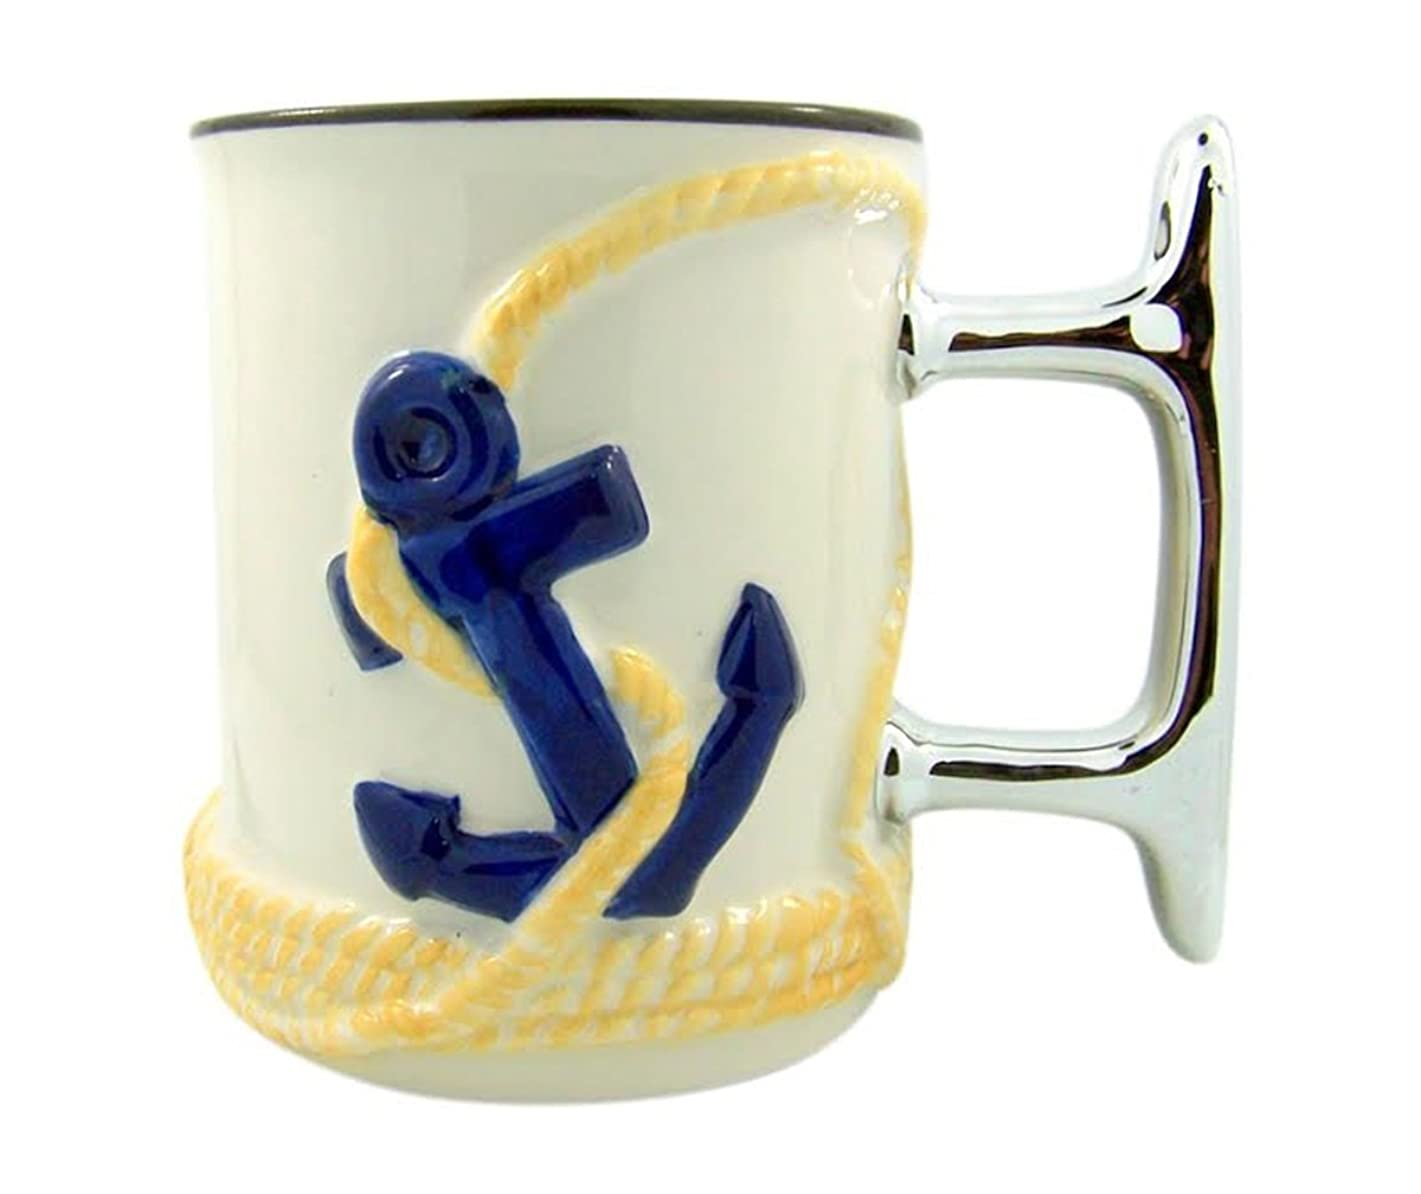 Beach Ship Cleat and Anchor Sculpted Handle Ceramic Coffee Mug, 16 oz